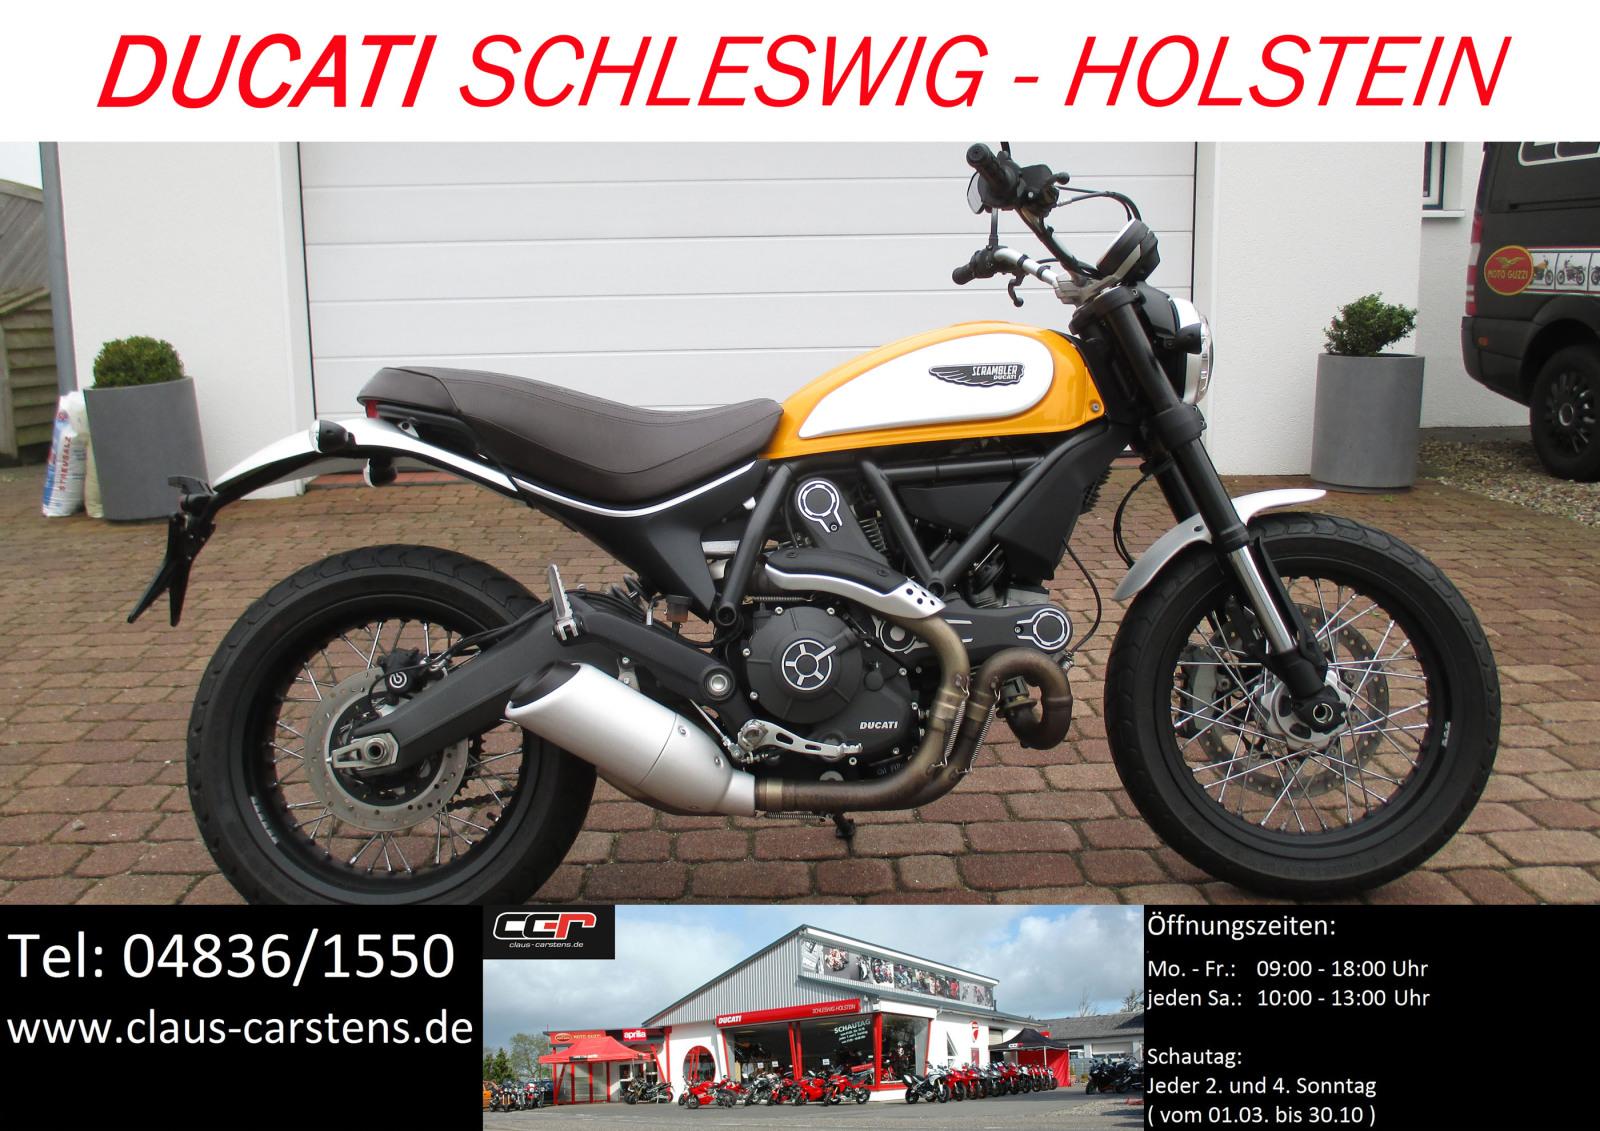 Ducati Schleswig Holstein cc-r